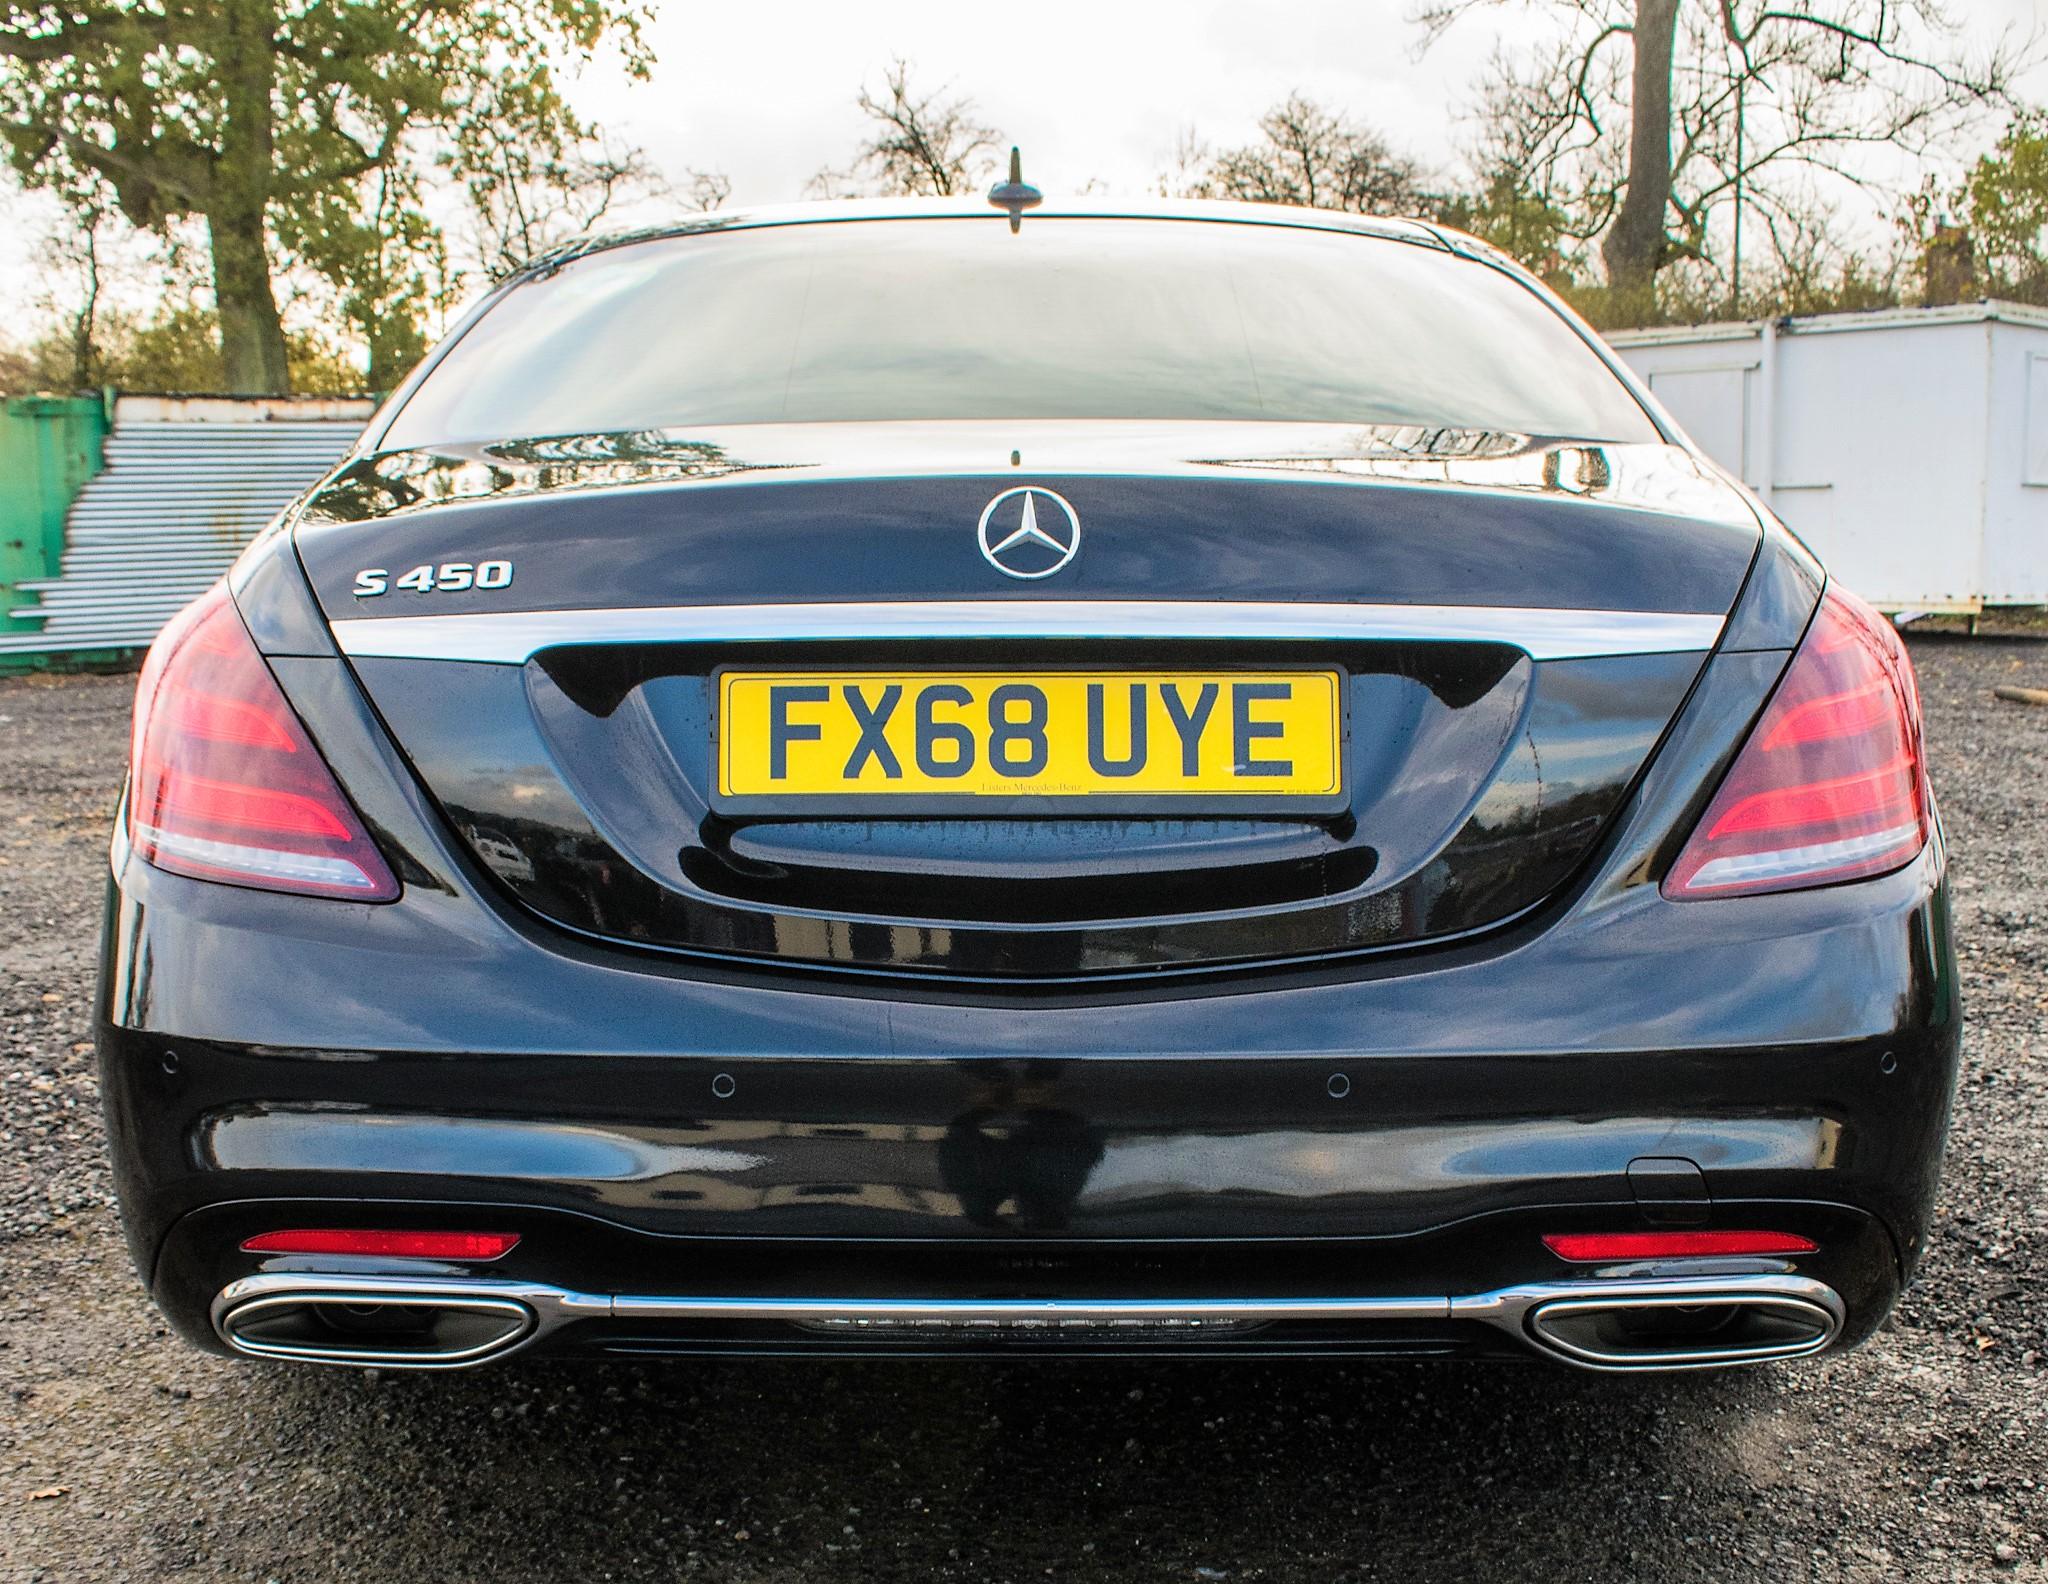 Mercedes Benz S450 L AMG Line Executive auto petrol 4 door saloon car Registration Number: FX68 - Image 6 of 33